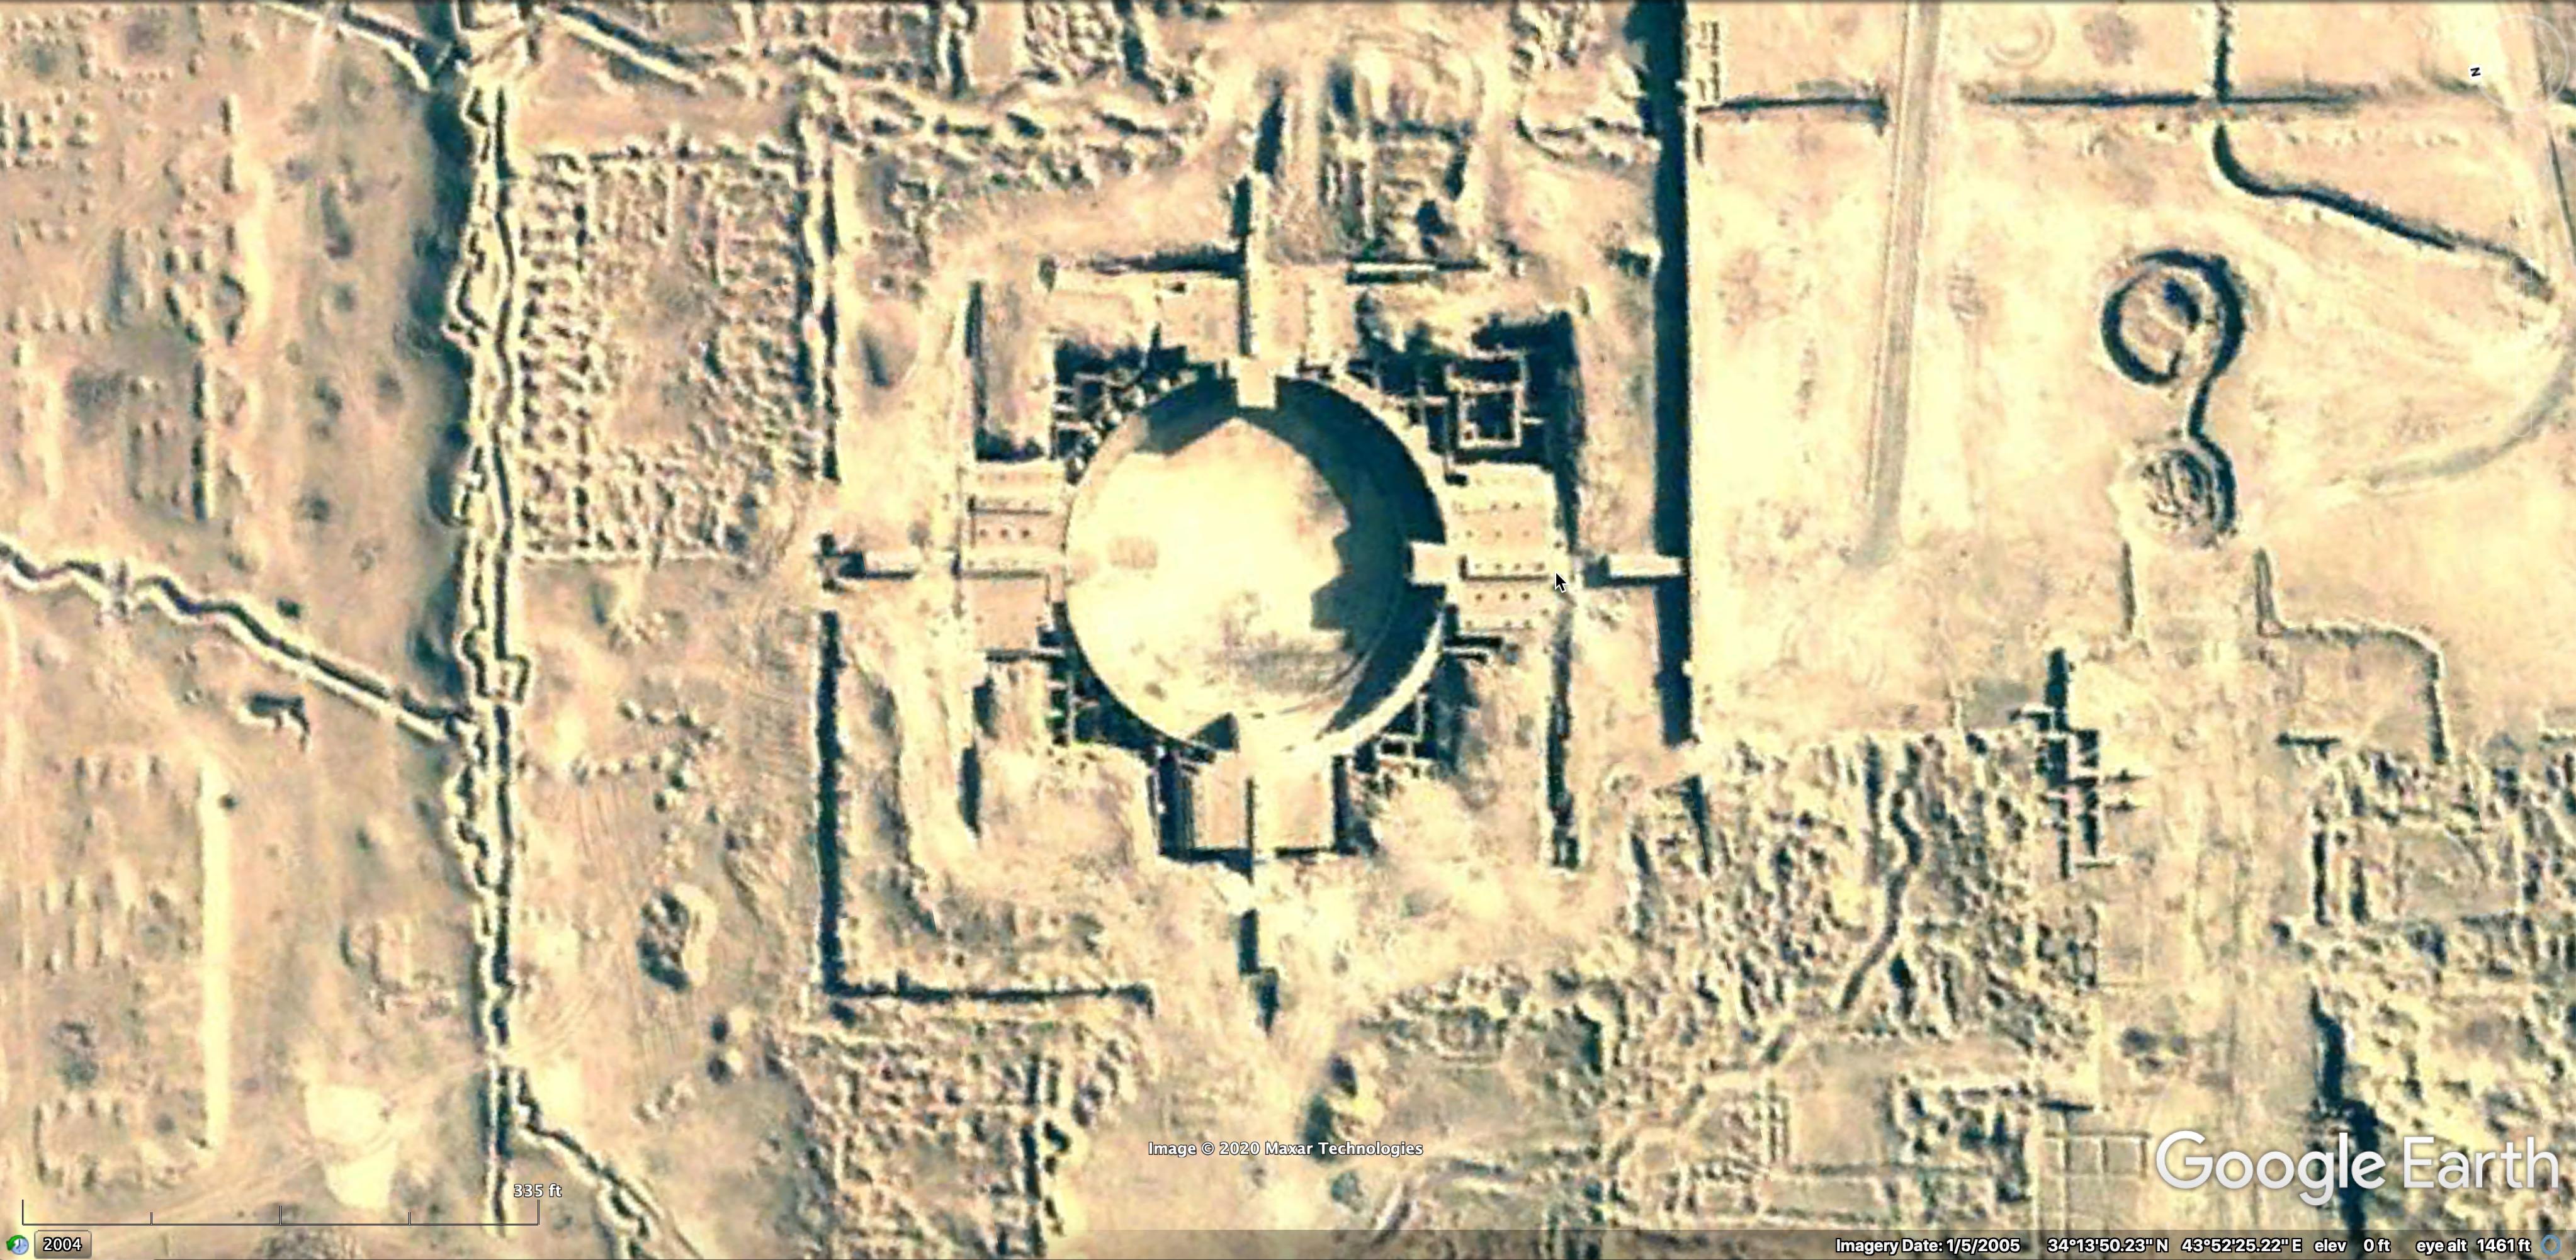 Google Earth Pro 2020-09-29 08-49-28.jpg